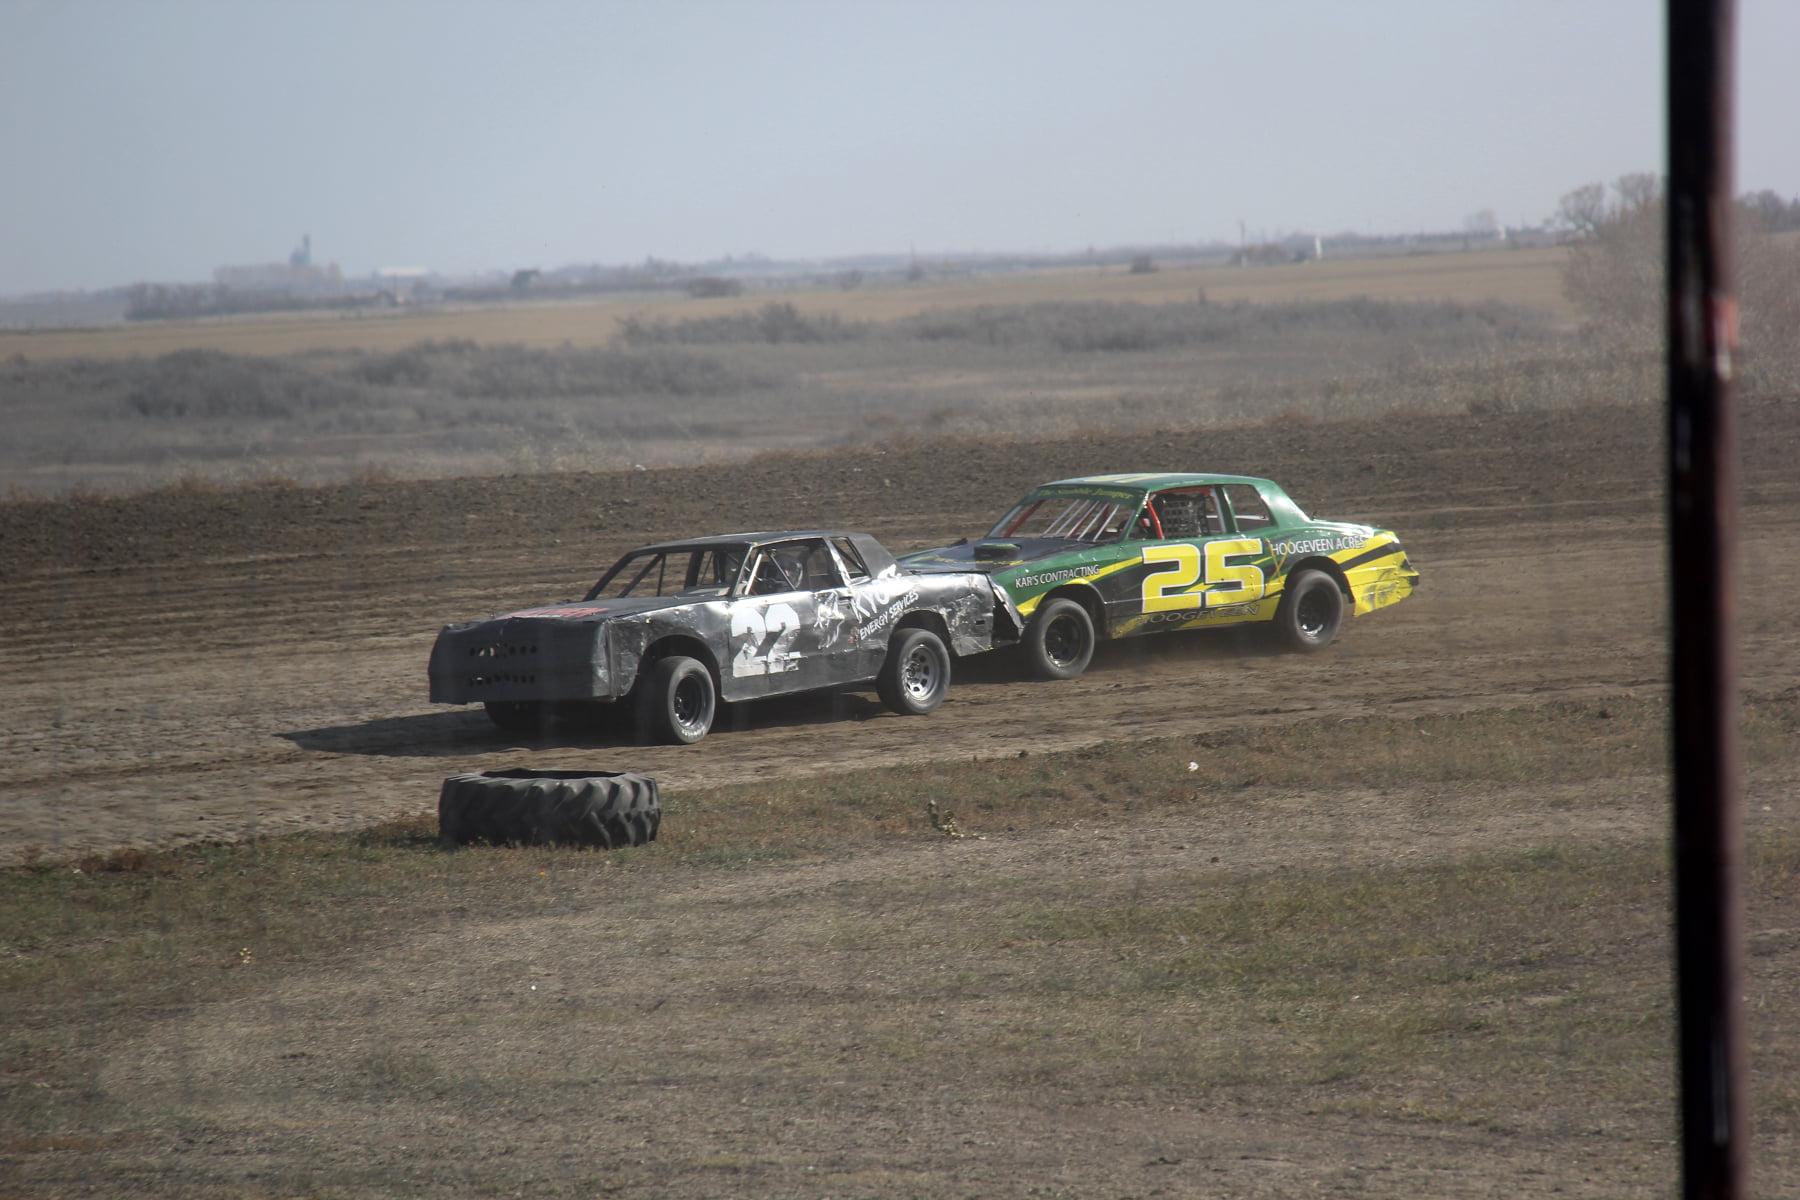 Outlook_Racing_Kemmer_Racing_Photography_15.jpg